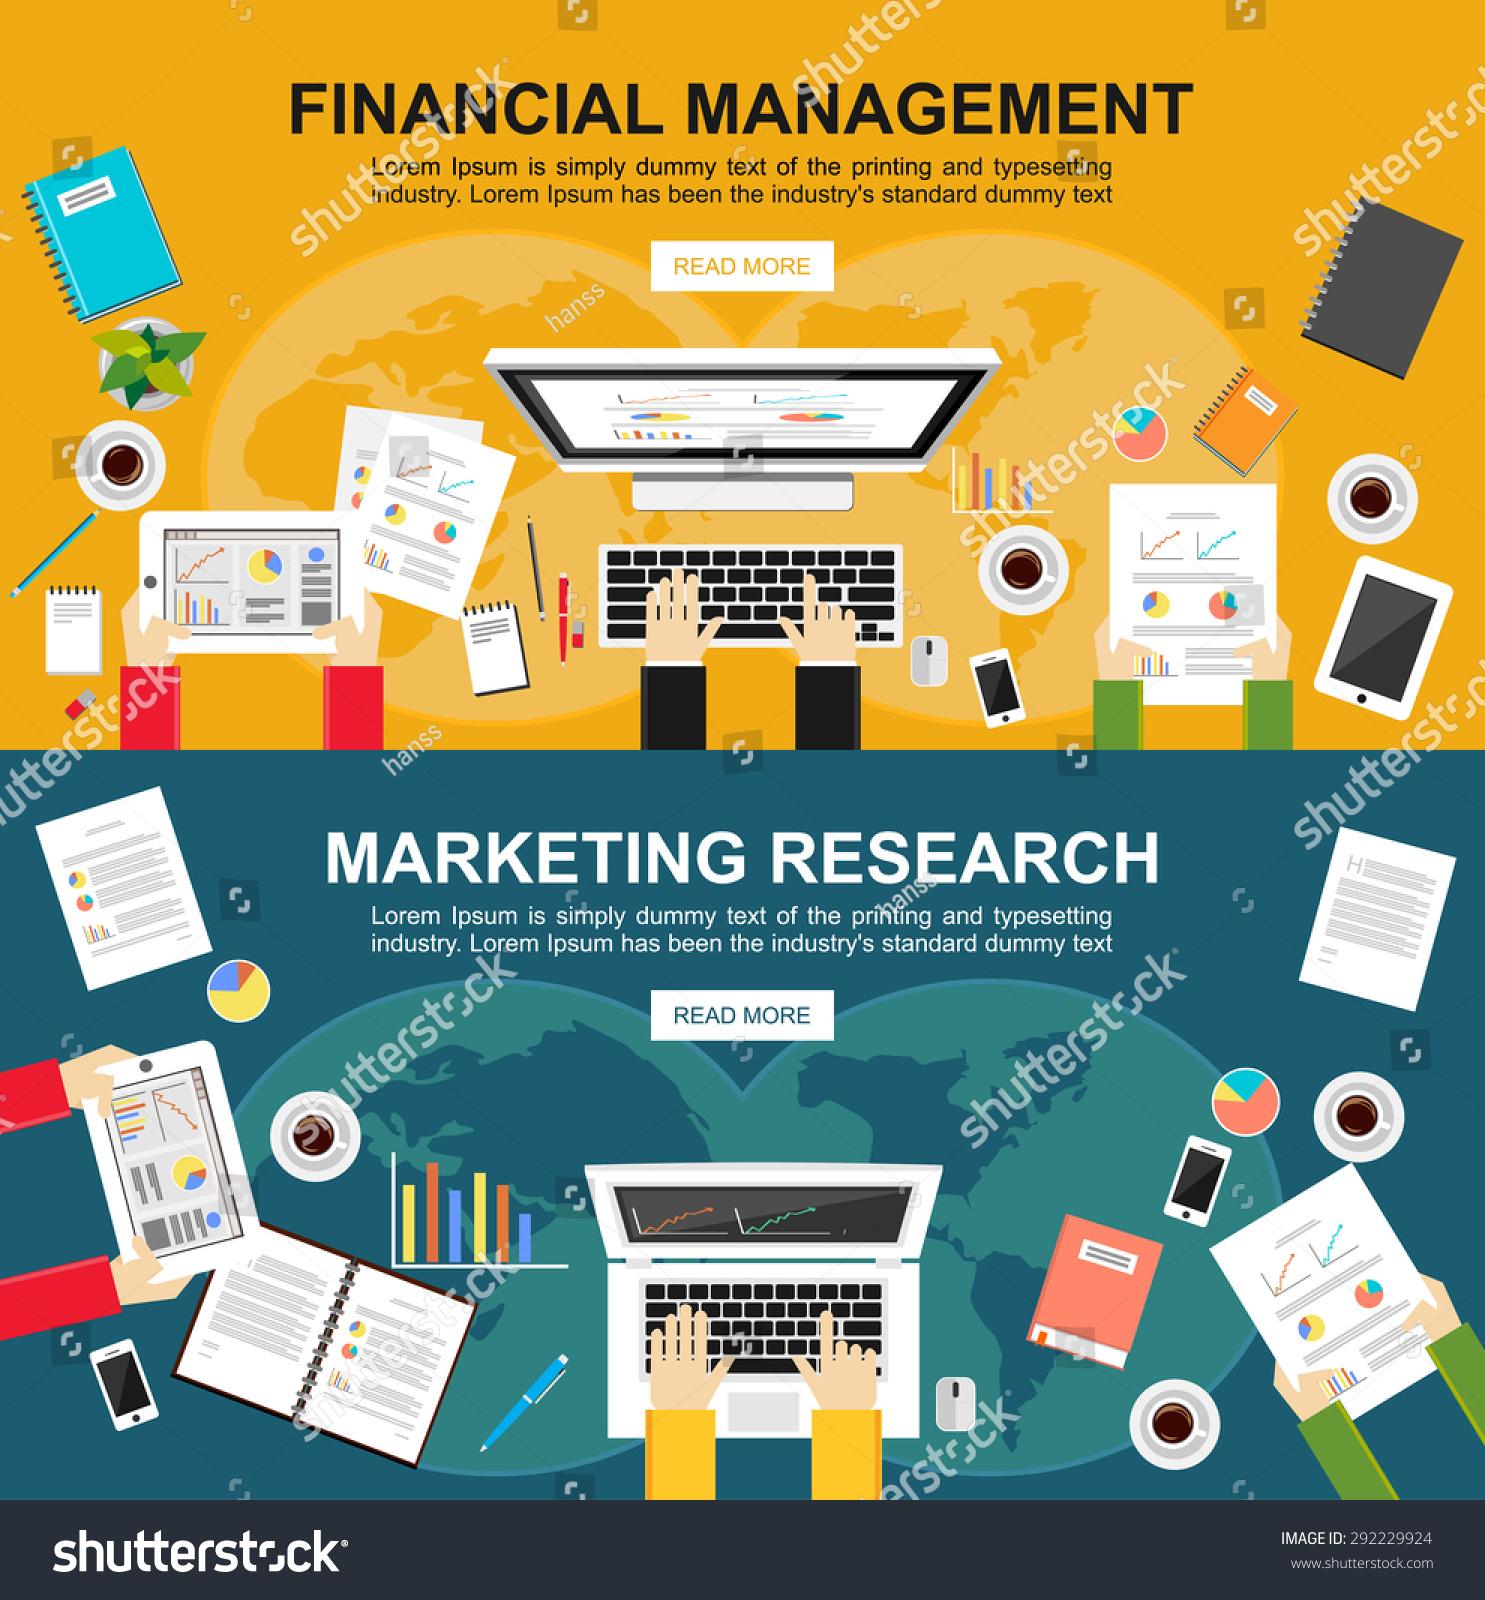 Financial Management: Banner Financial Management Marketing Research Flat Stock